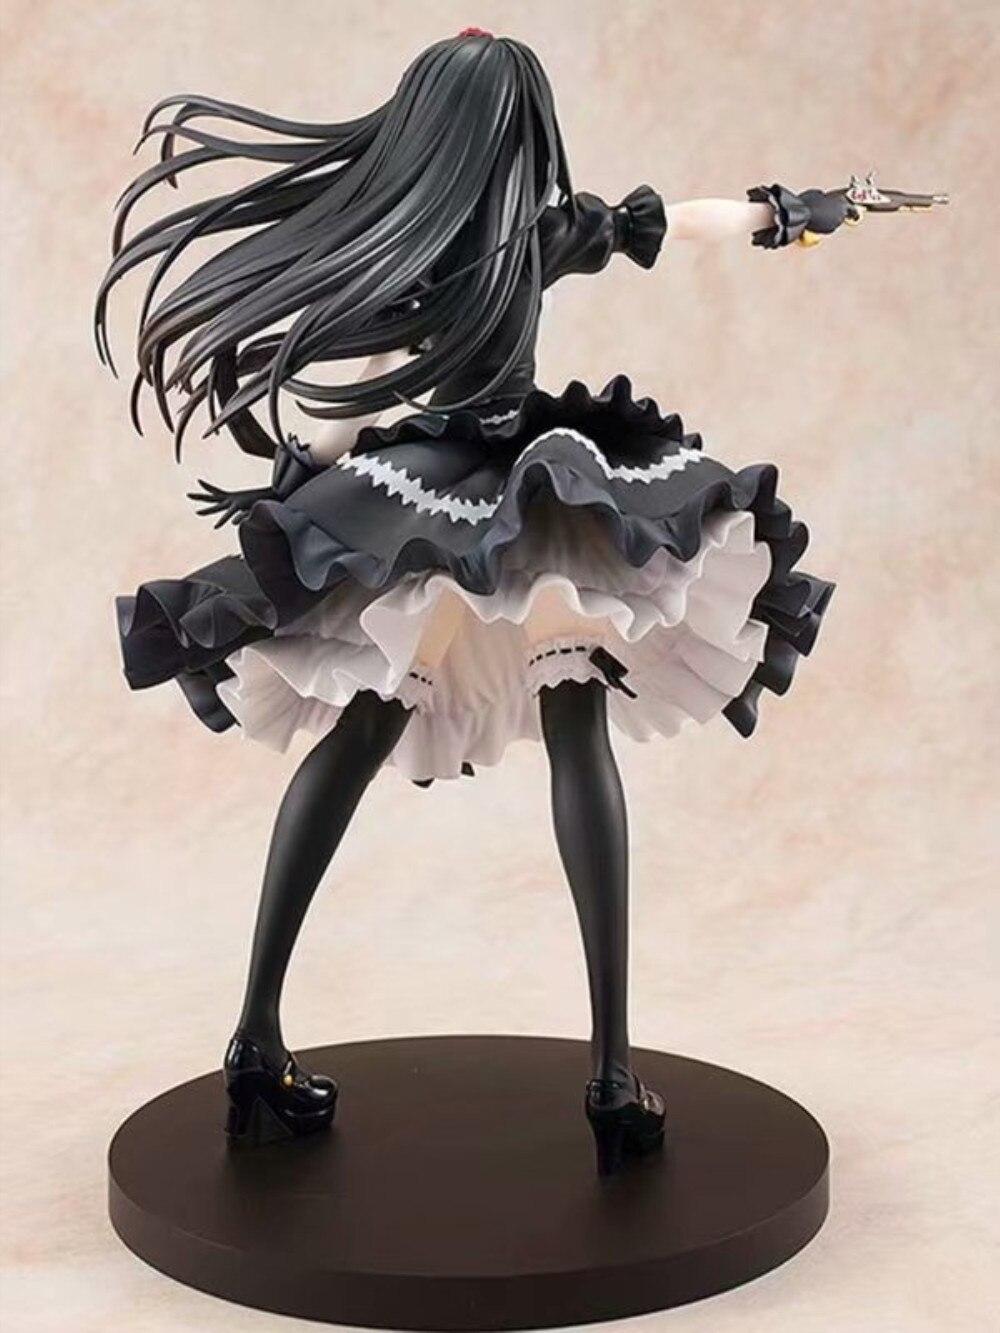 Anime Date A Live Nightmare Tokisaki Kurumi Action Figure Fantasia 30th Anniversary Figurine PVC Model Doll Girl Gift Toys PM 2